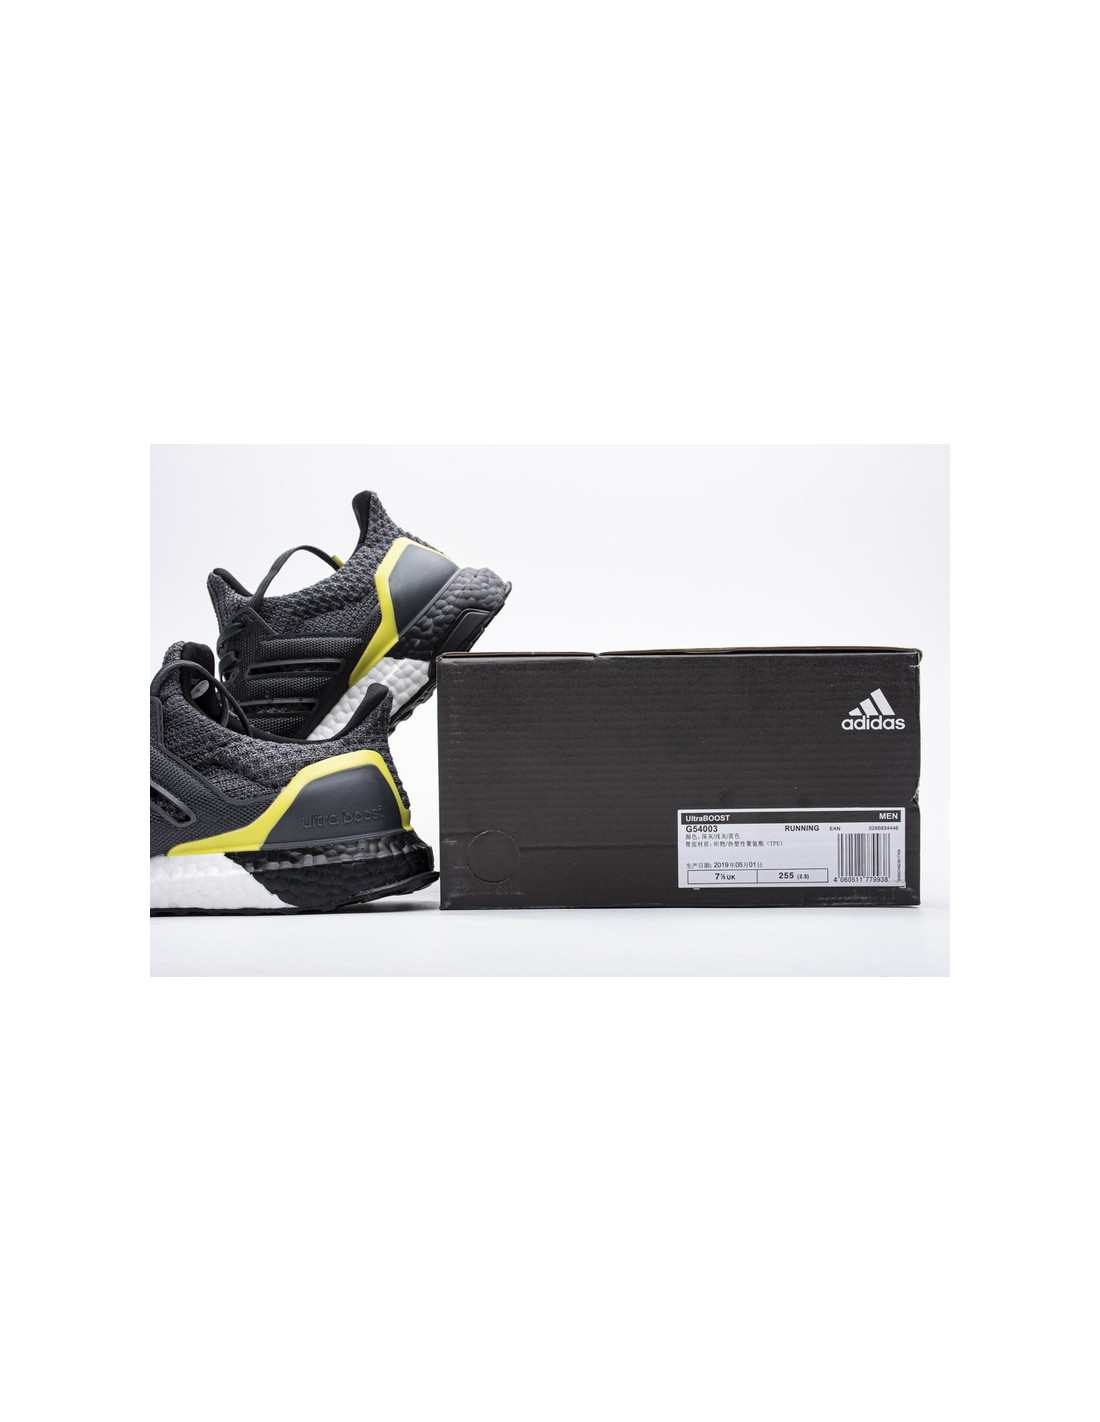 Adidas Men's UltraBoost 20